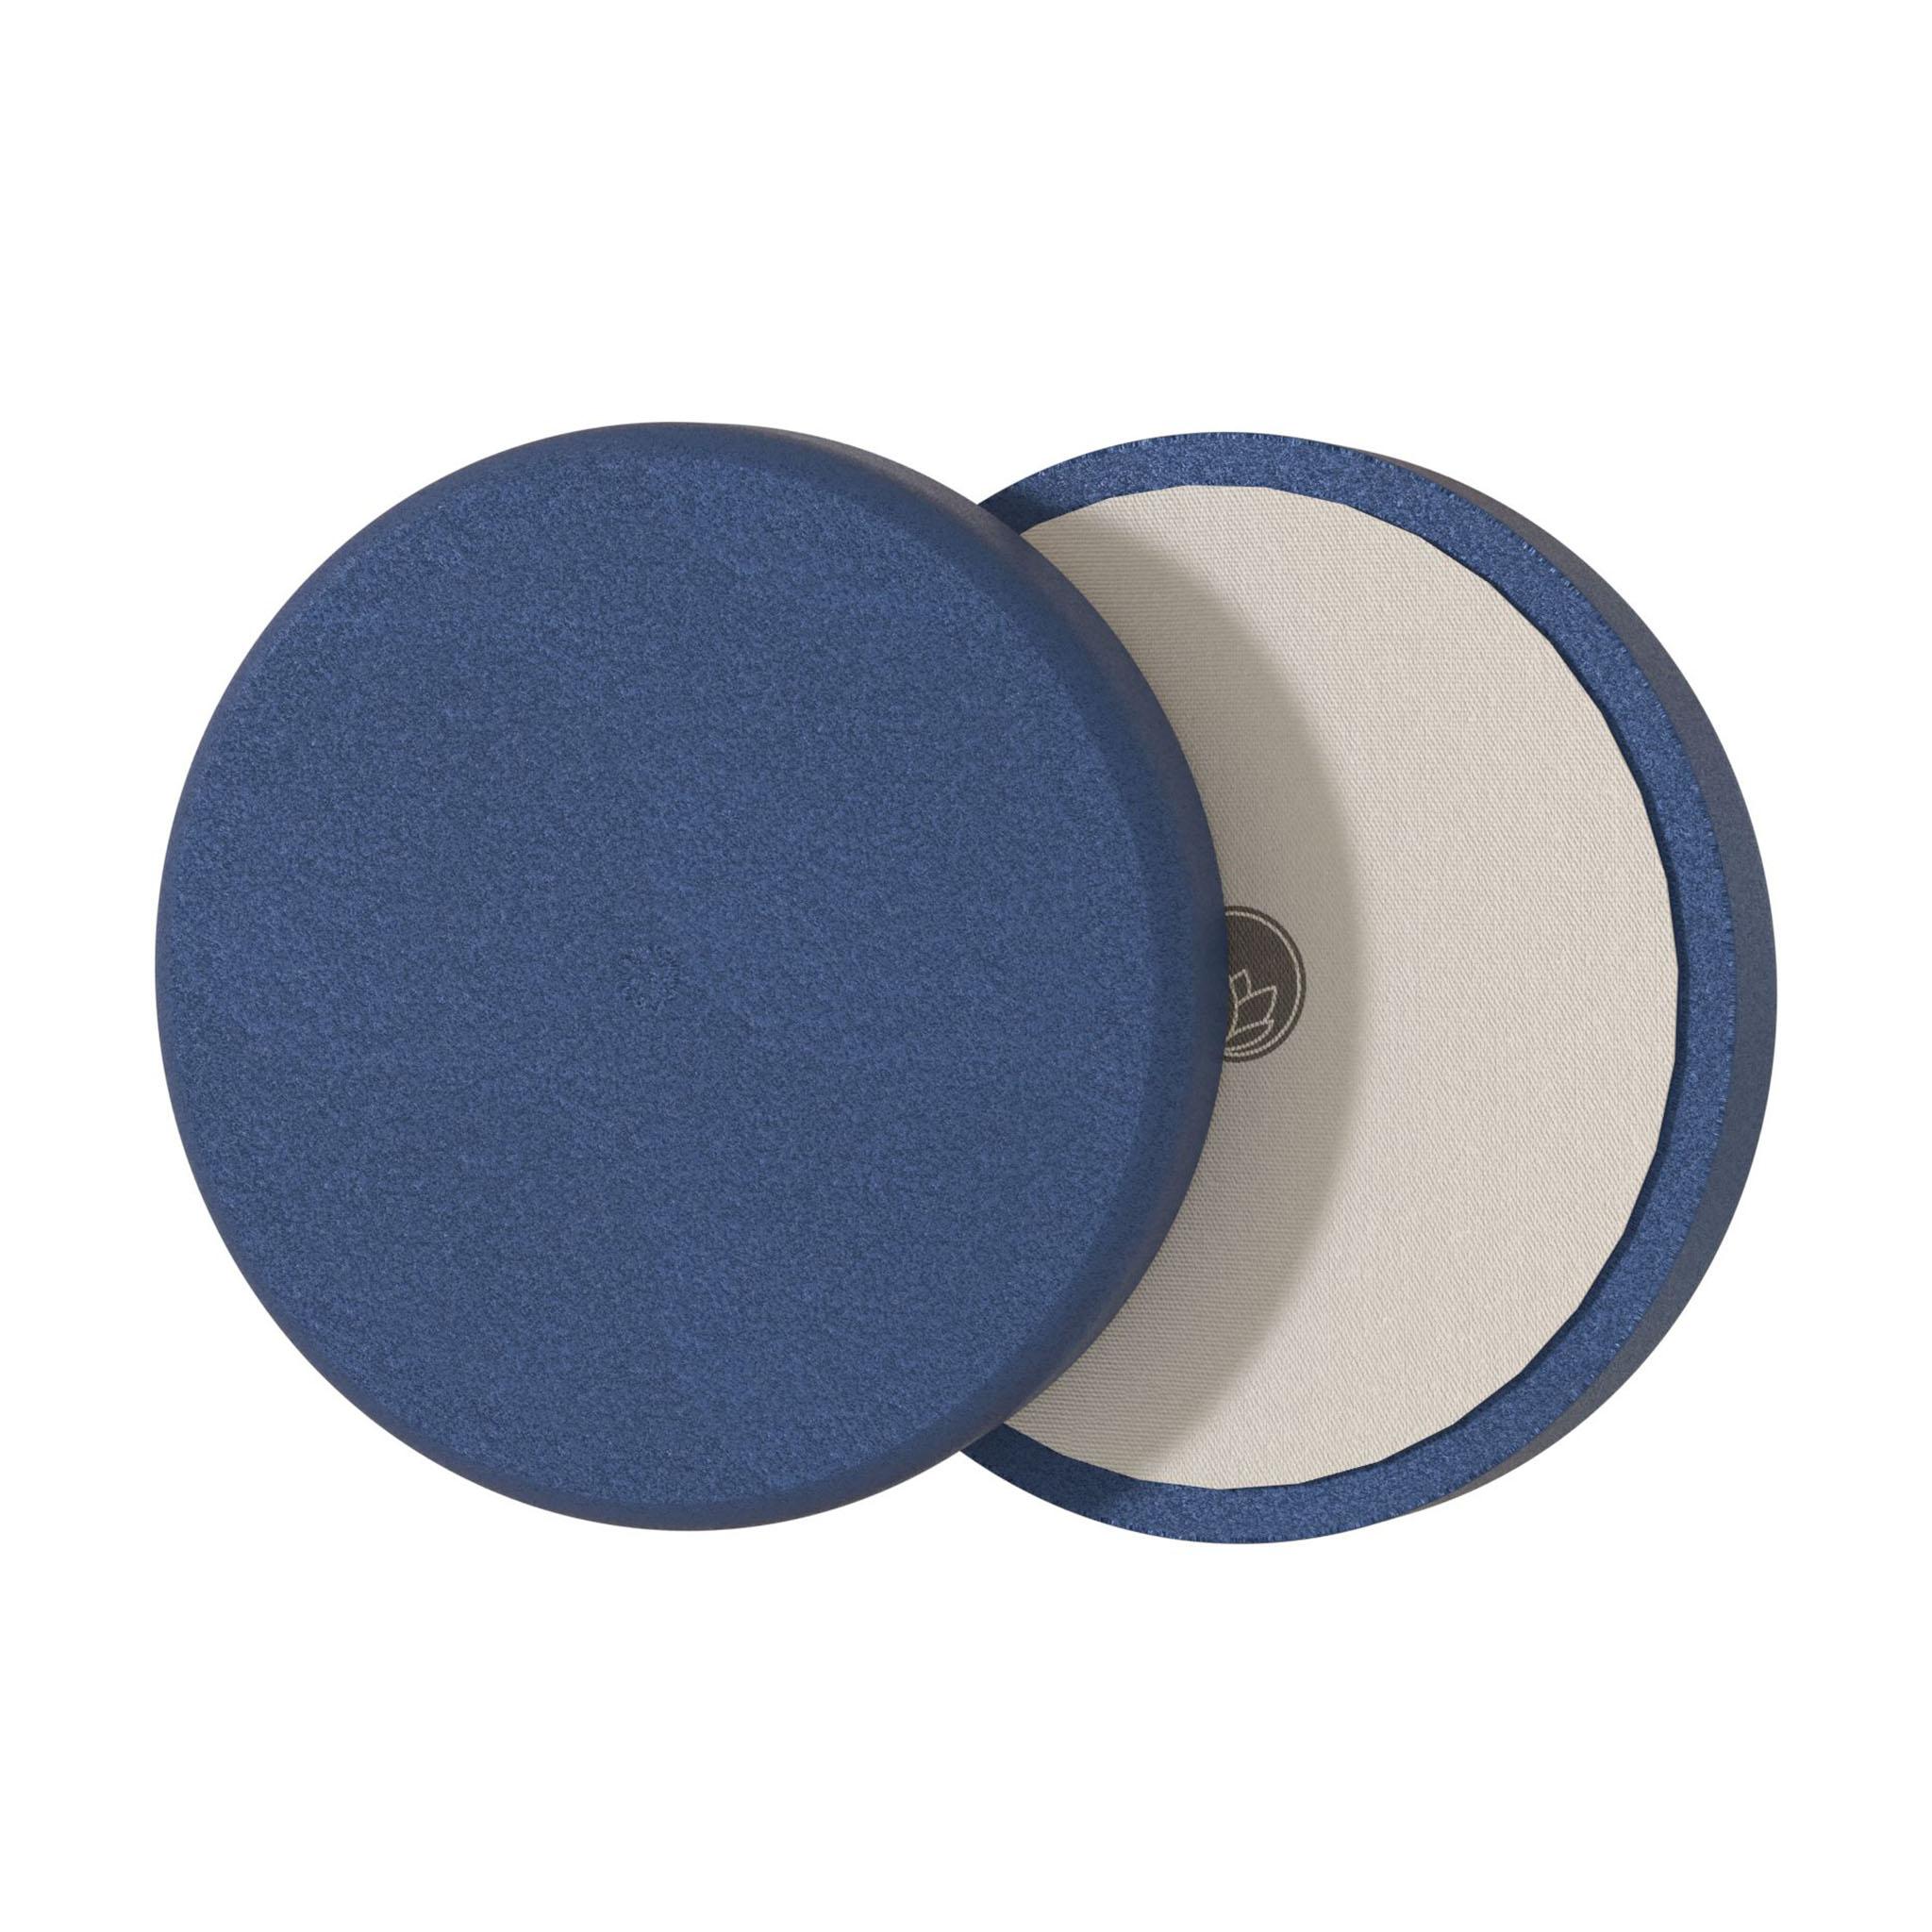 Skumrondell Nanolex Polishing Pad Soft, Blå, 65/55 x 22 mm, 4 st